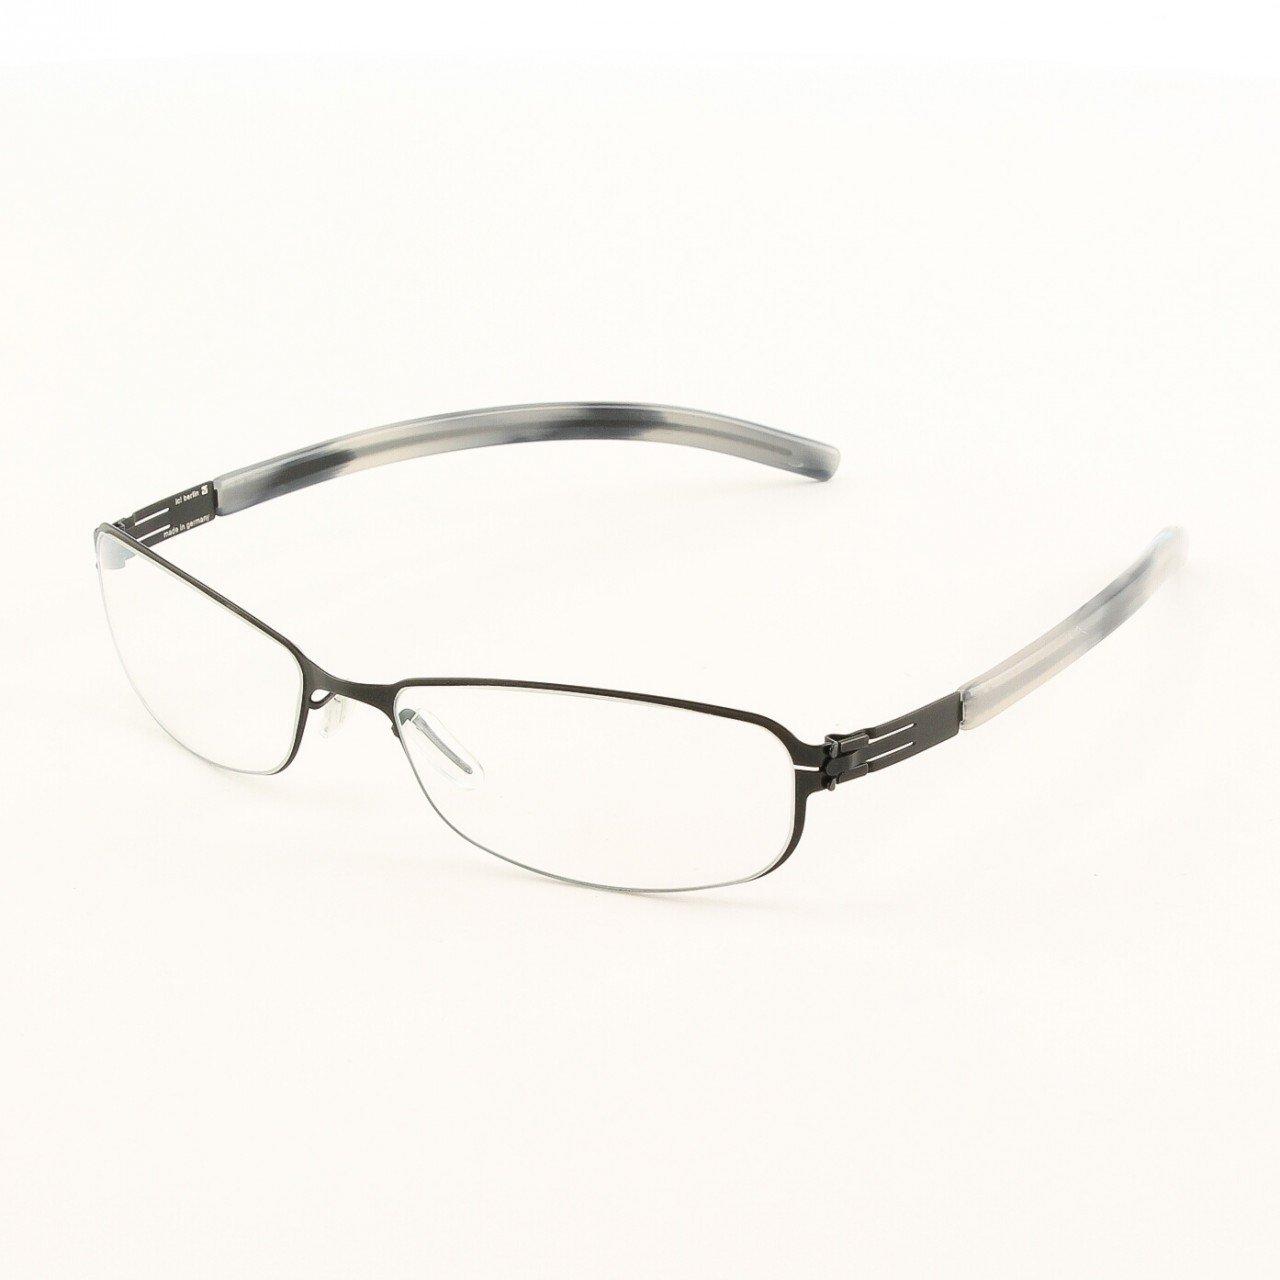 ic! Berlin Haffkrug Eyeglasses Col. Gold with Clear Lenses